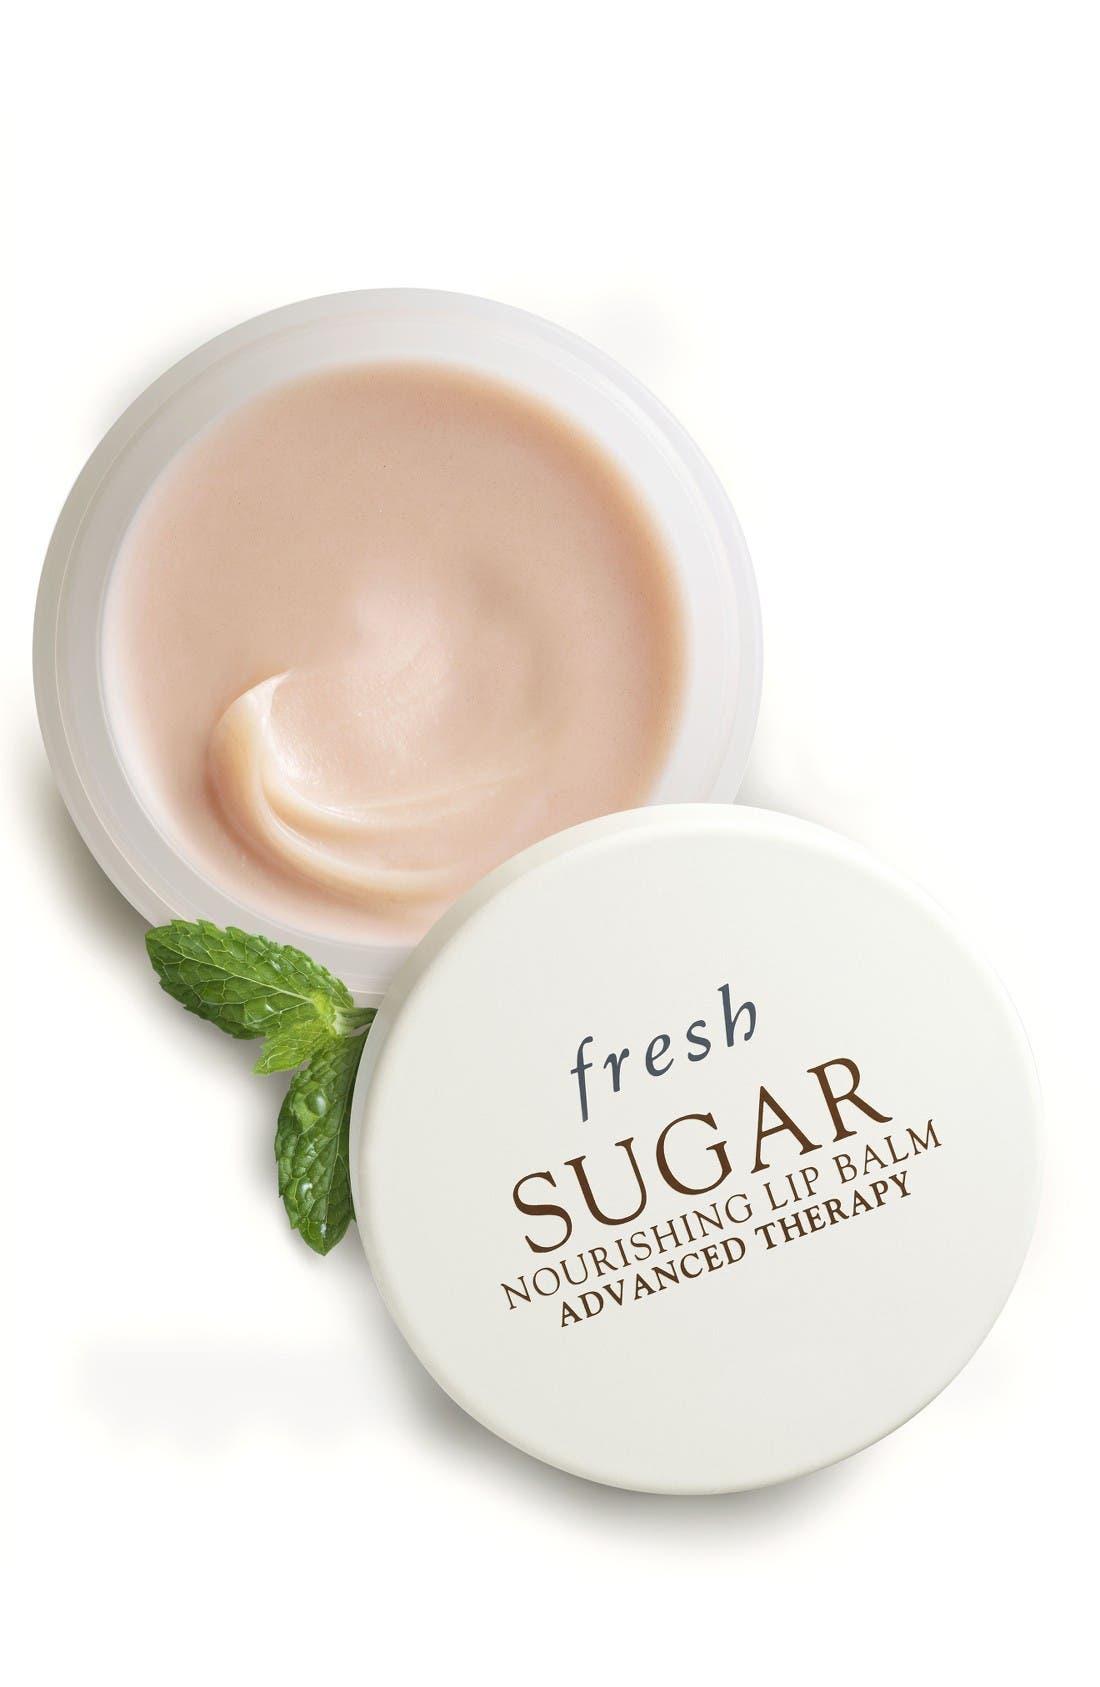 Sugar Nourishing Lip Balm Advanced Therapy,                             Alternate thumbnail 2, color,                             No Color